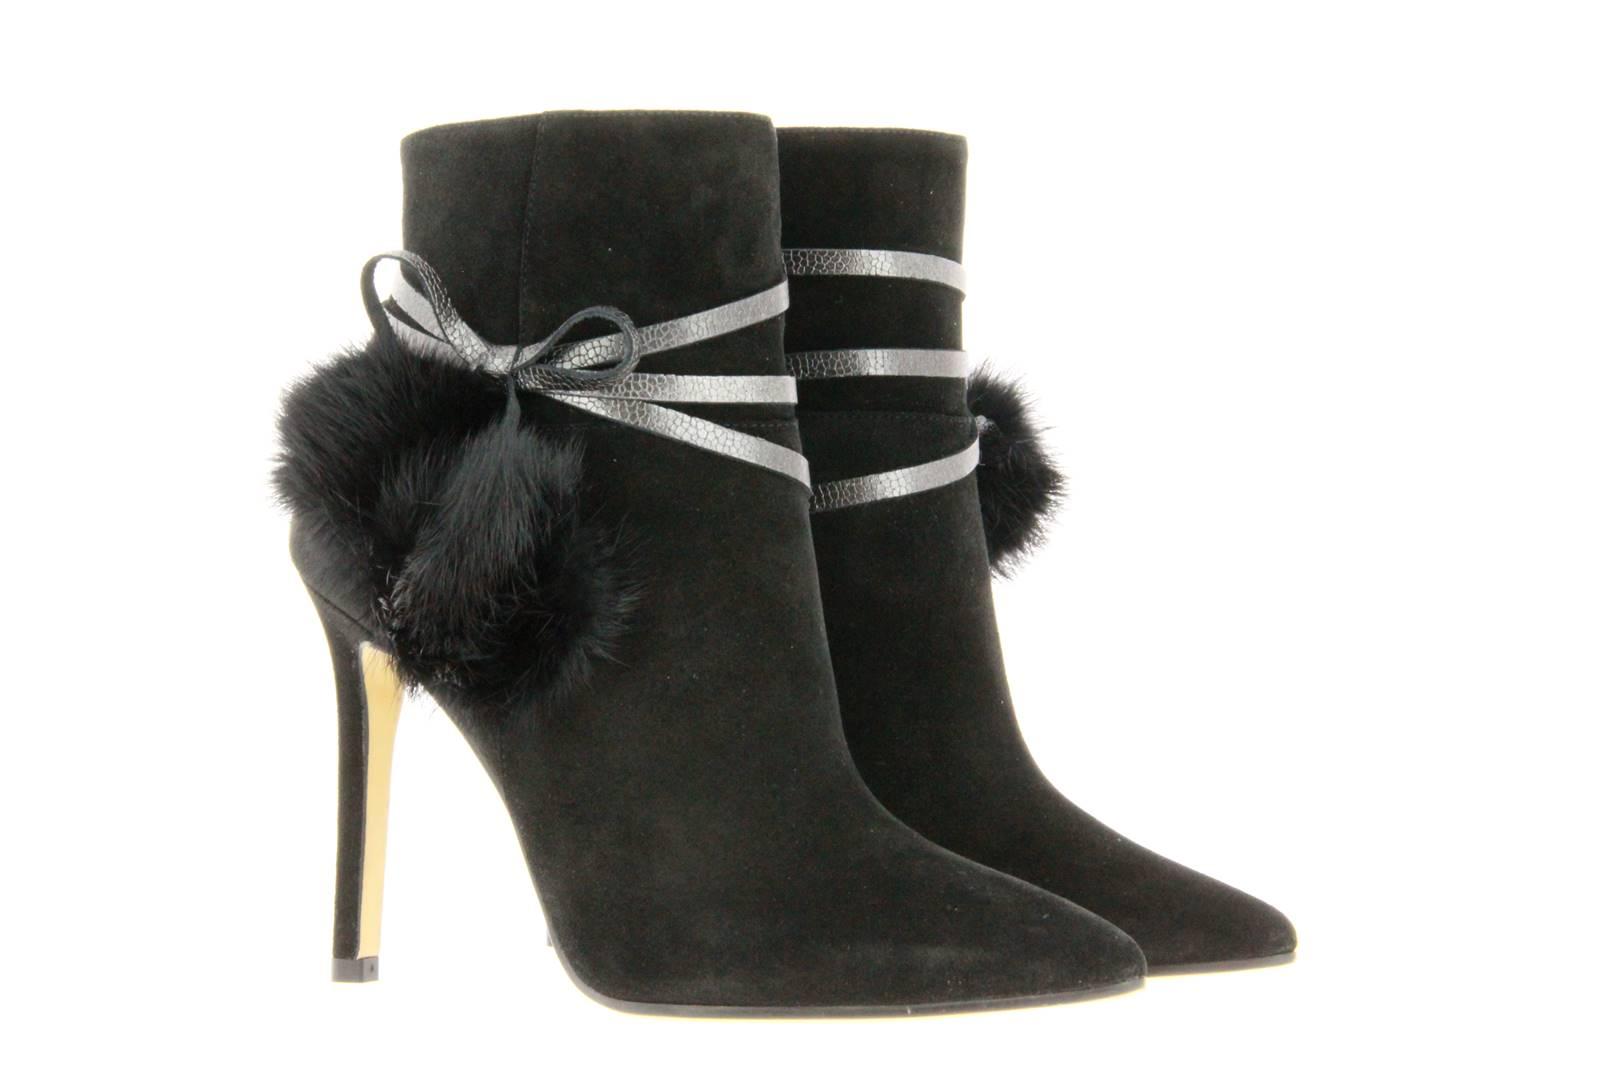 Lodi high heel ankle boots VINNY SILK NEGRO